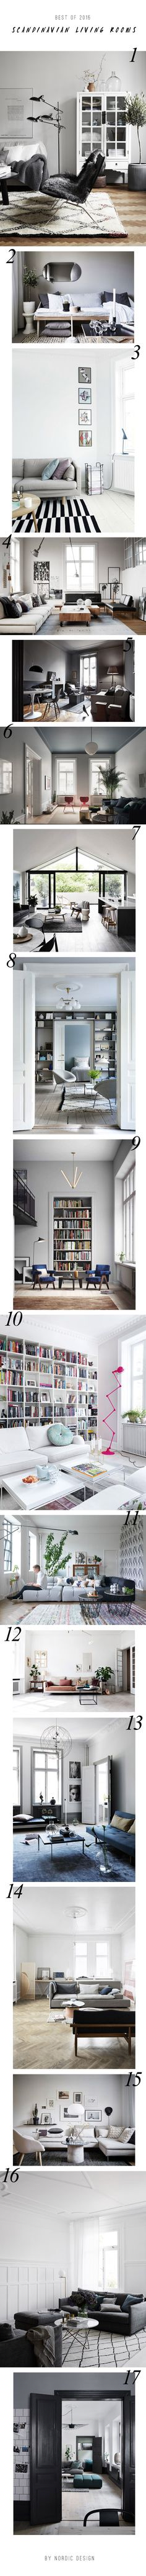 17 of the most inspiring Scandinavian living rooms